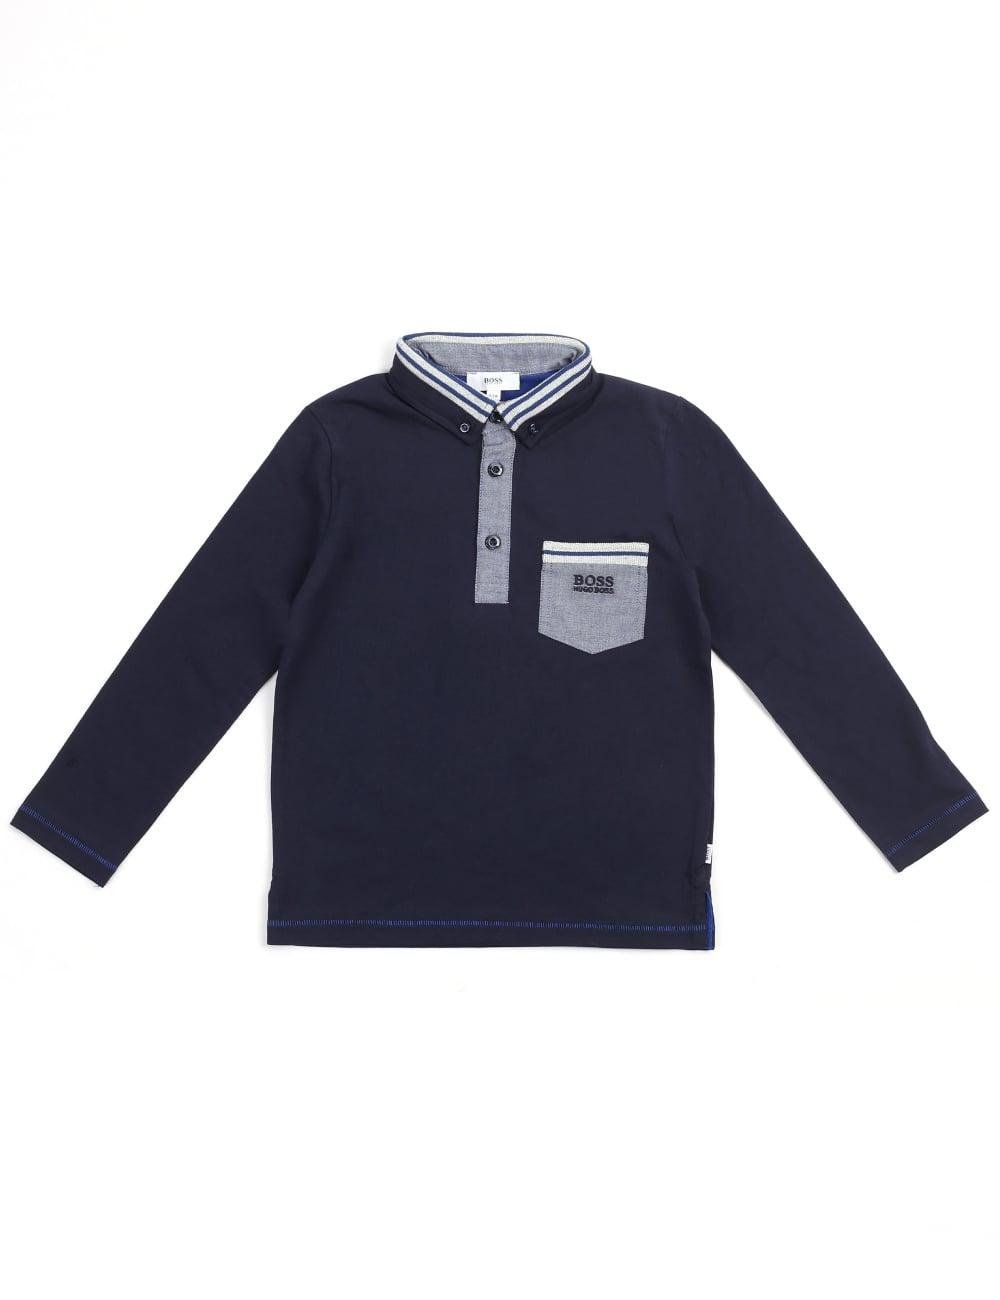 264592f43 Hugo Boss Youth/Boys Long Sleeve Polo Top